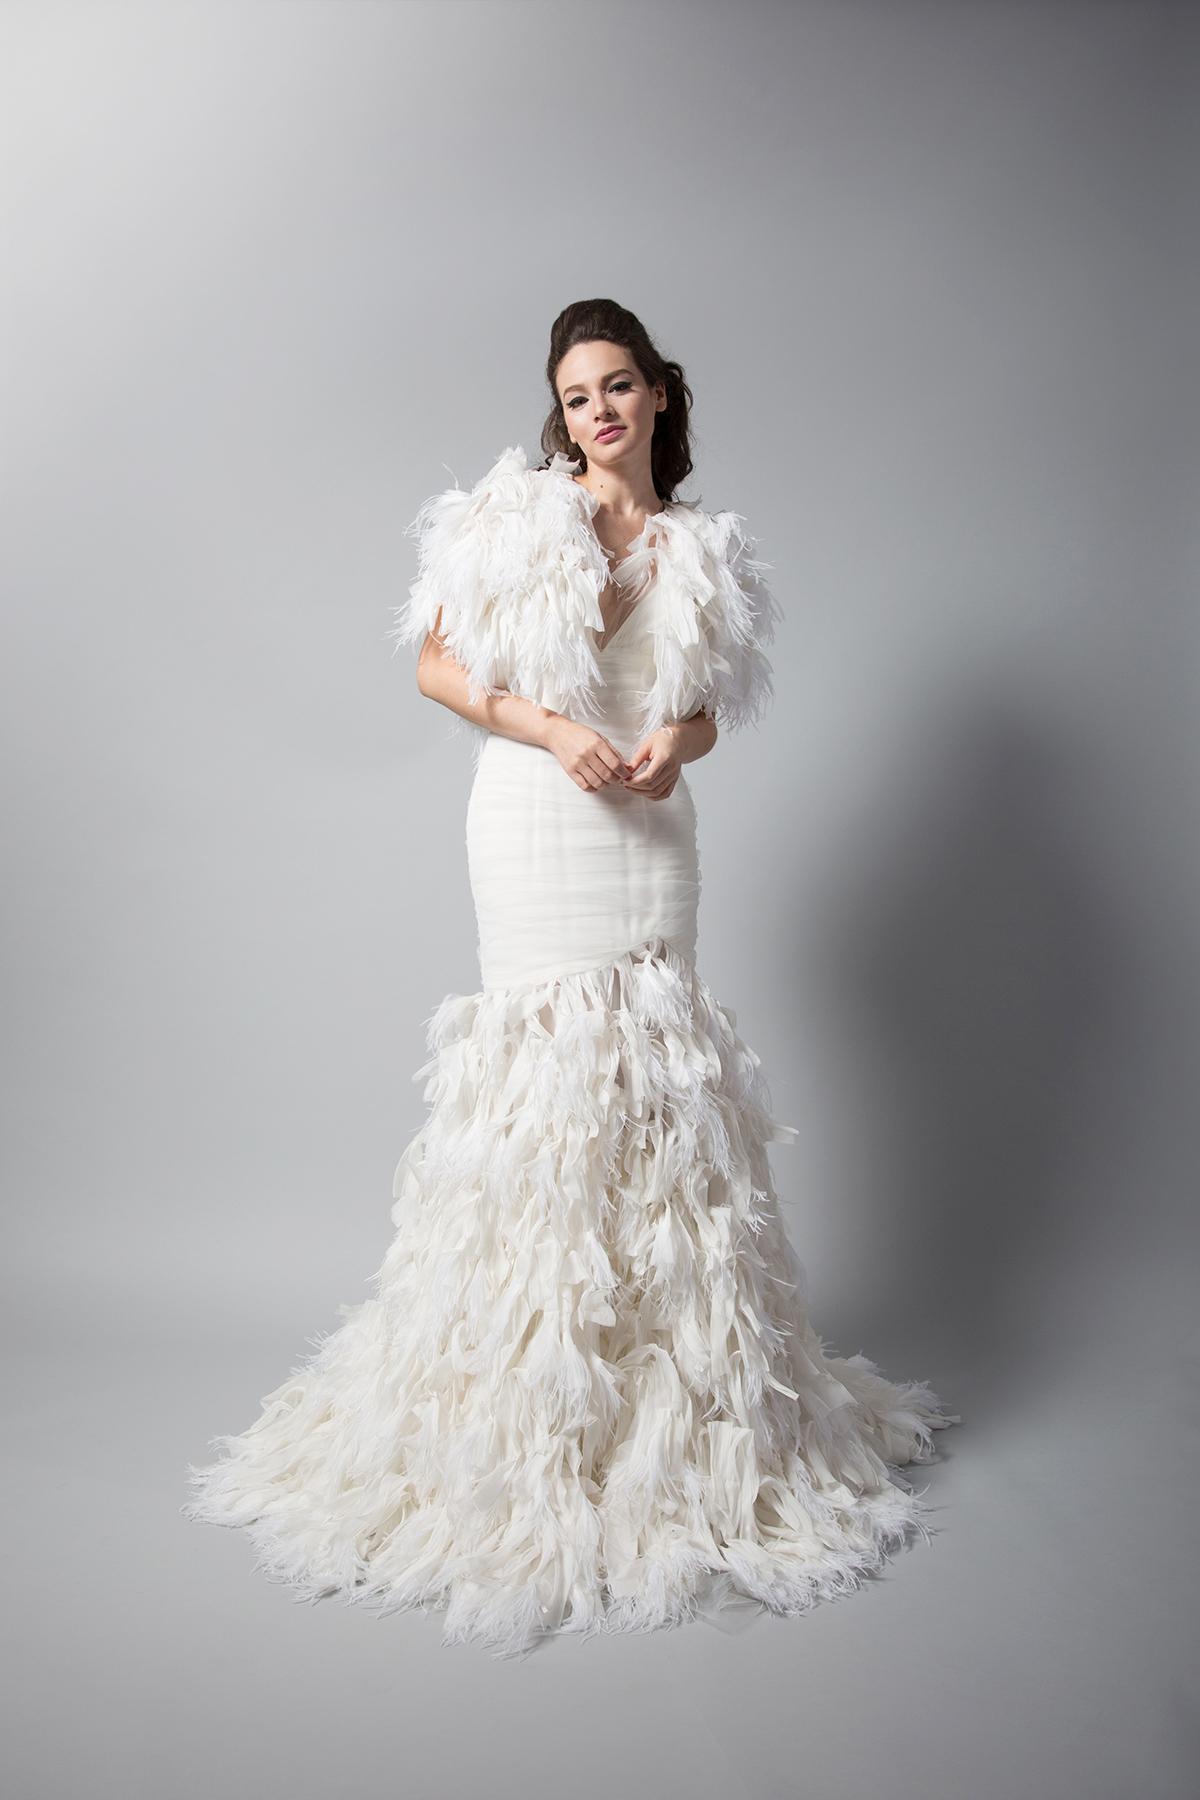 randi rahm trumpet wedding dress with feathers fall 2018